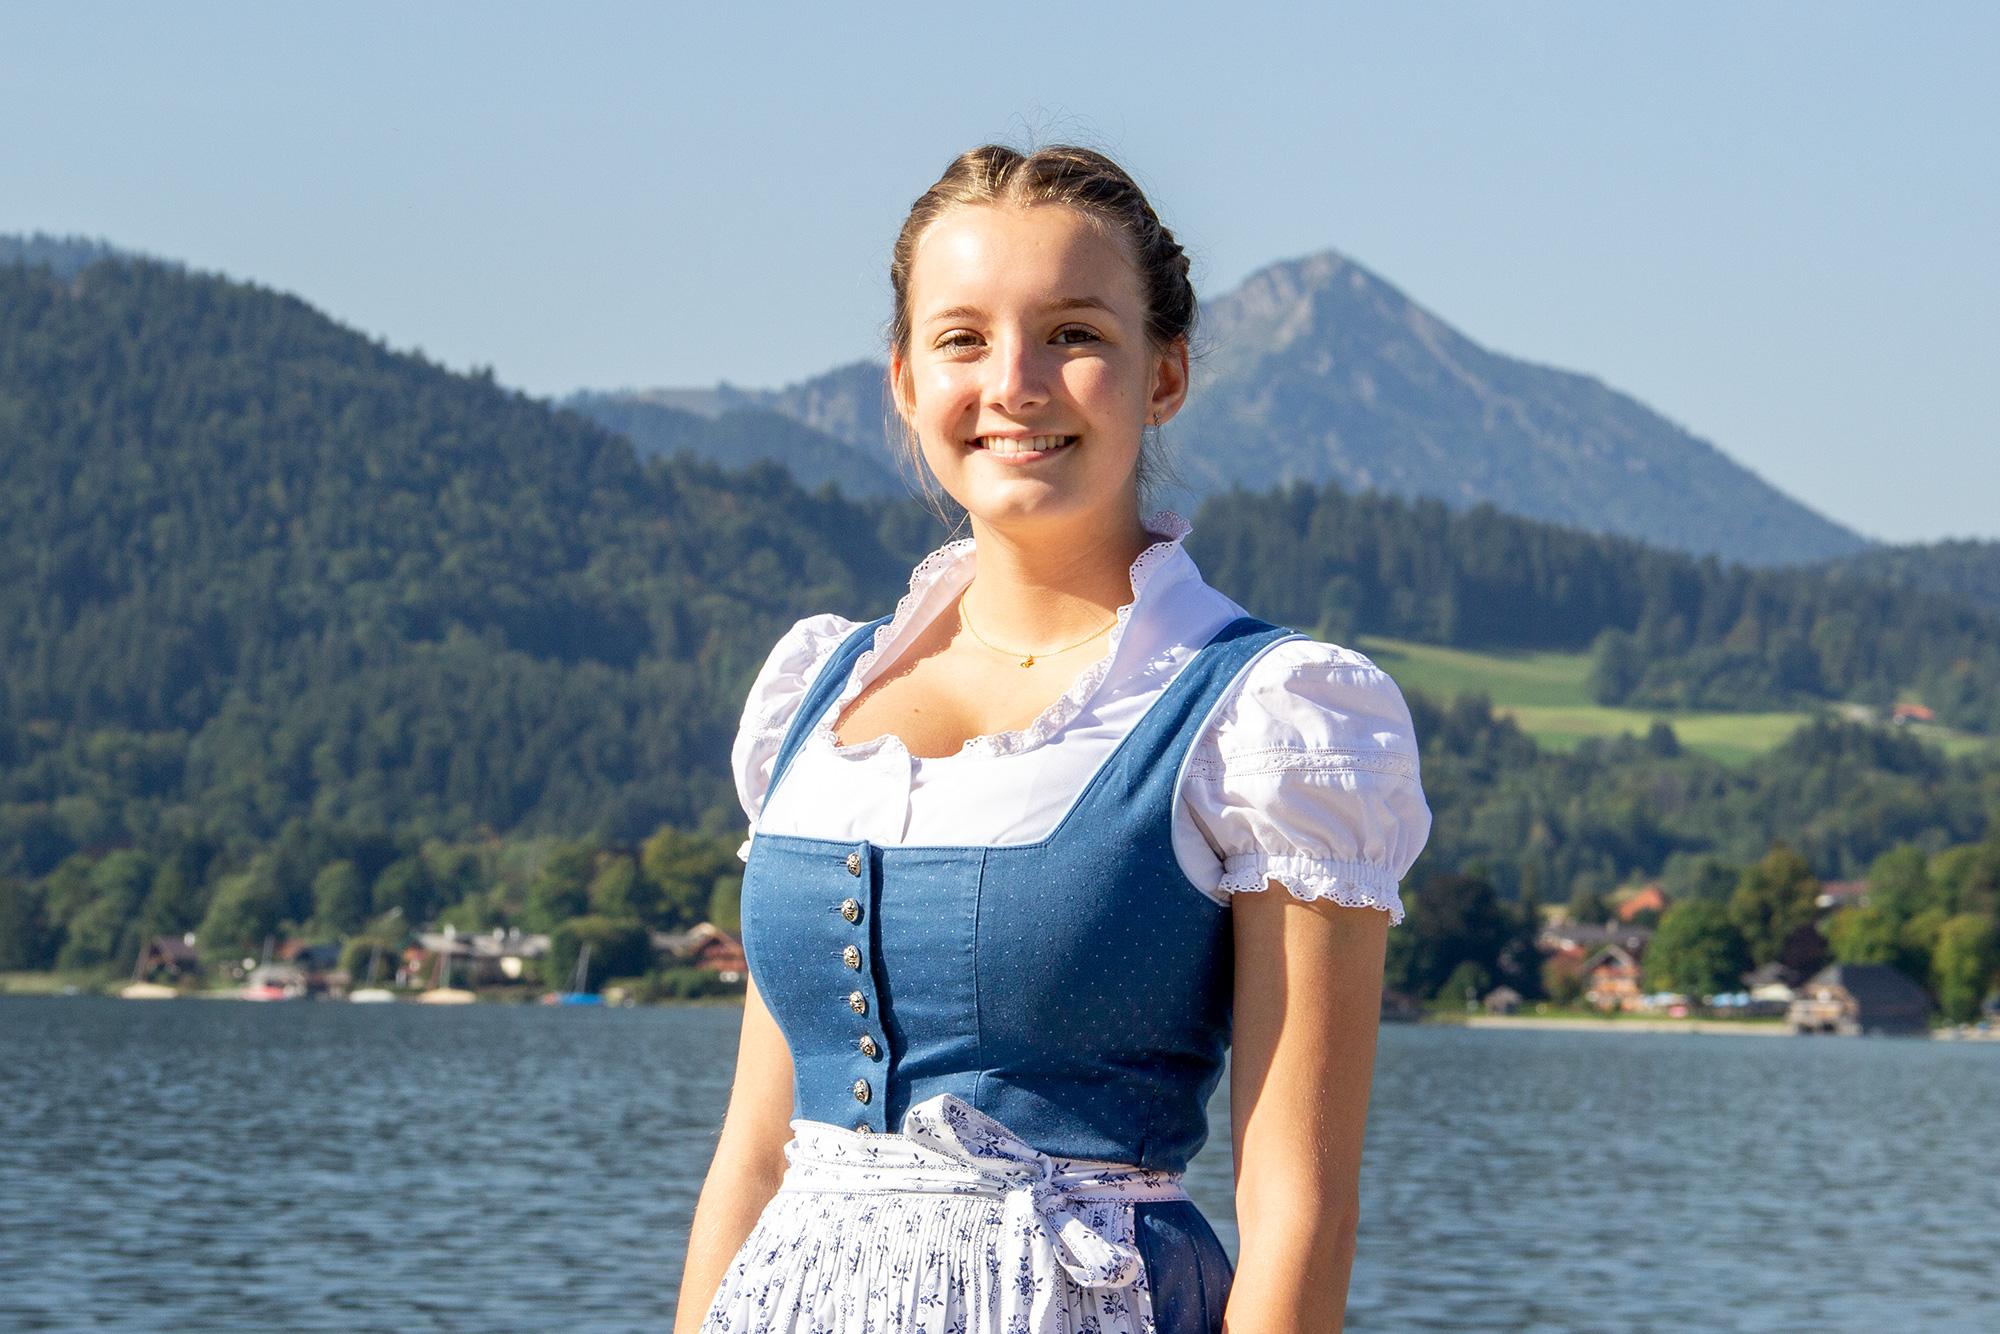 Magdalena Margreiter